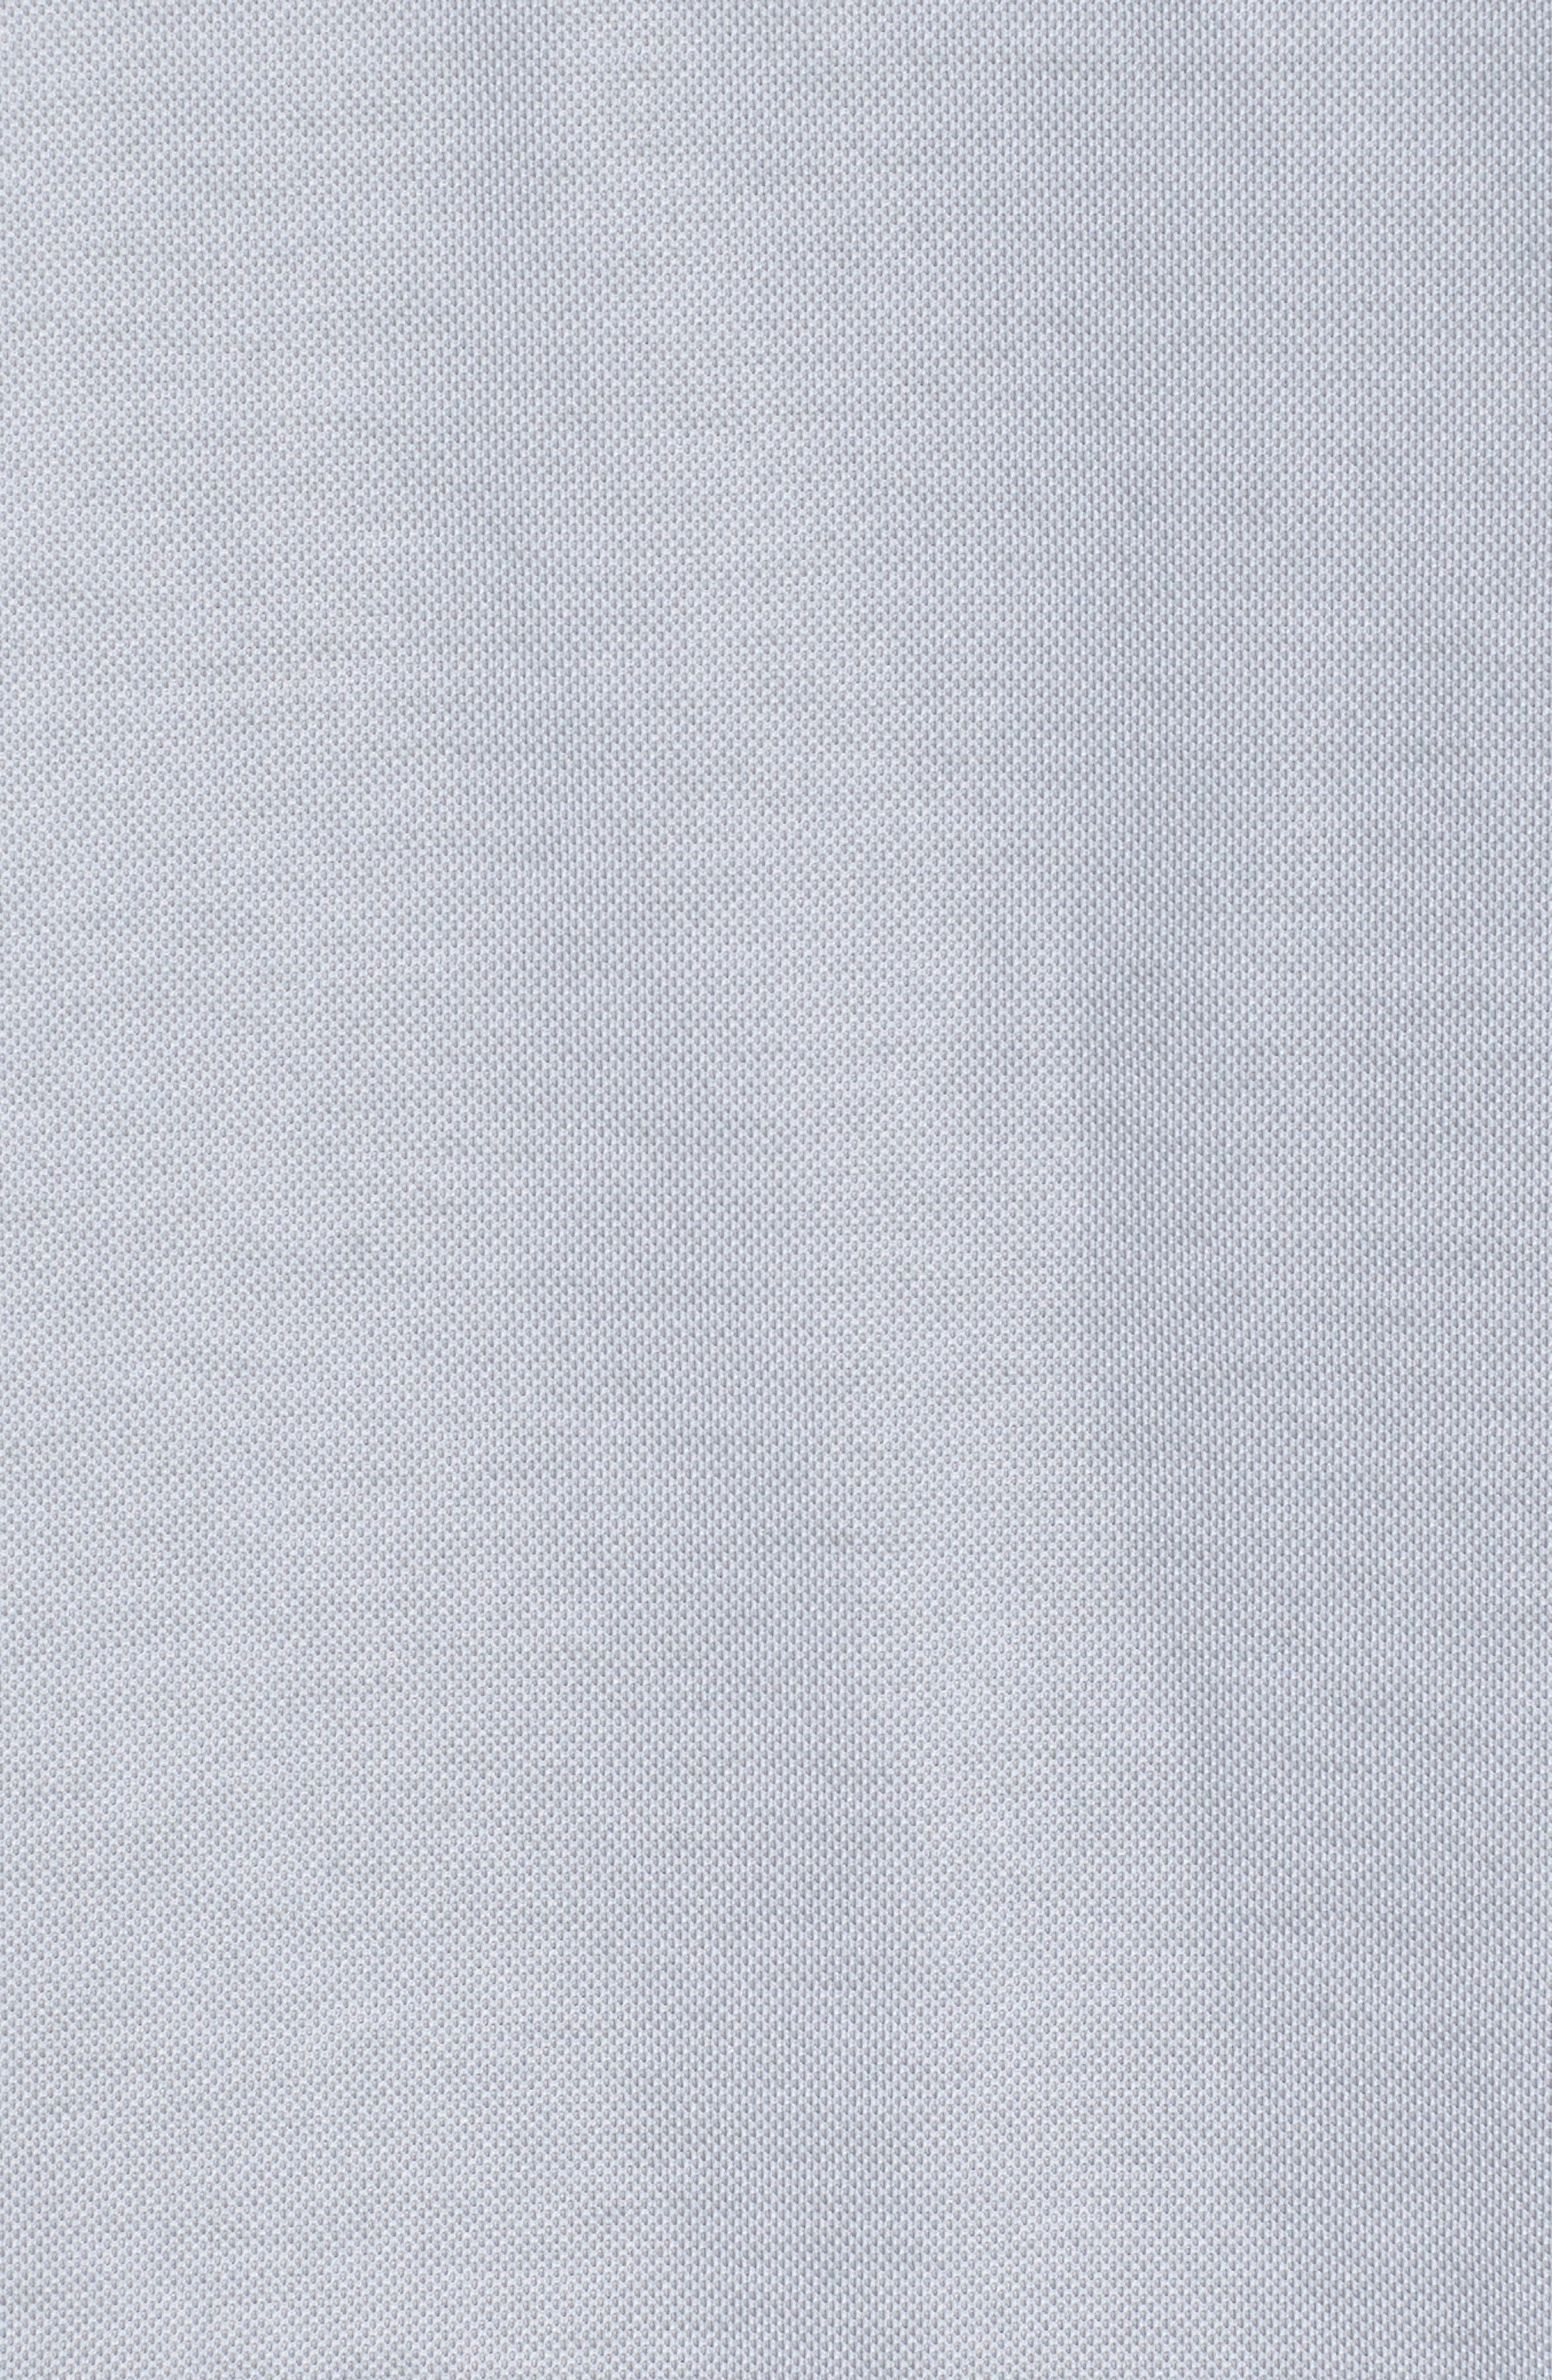 Jalegre Regular Fit Polo,                             Alternate thumbnail 5, color,                             HEATHER MONUMENT